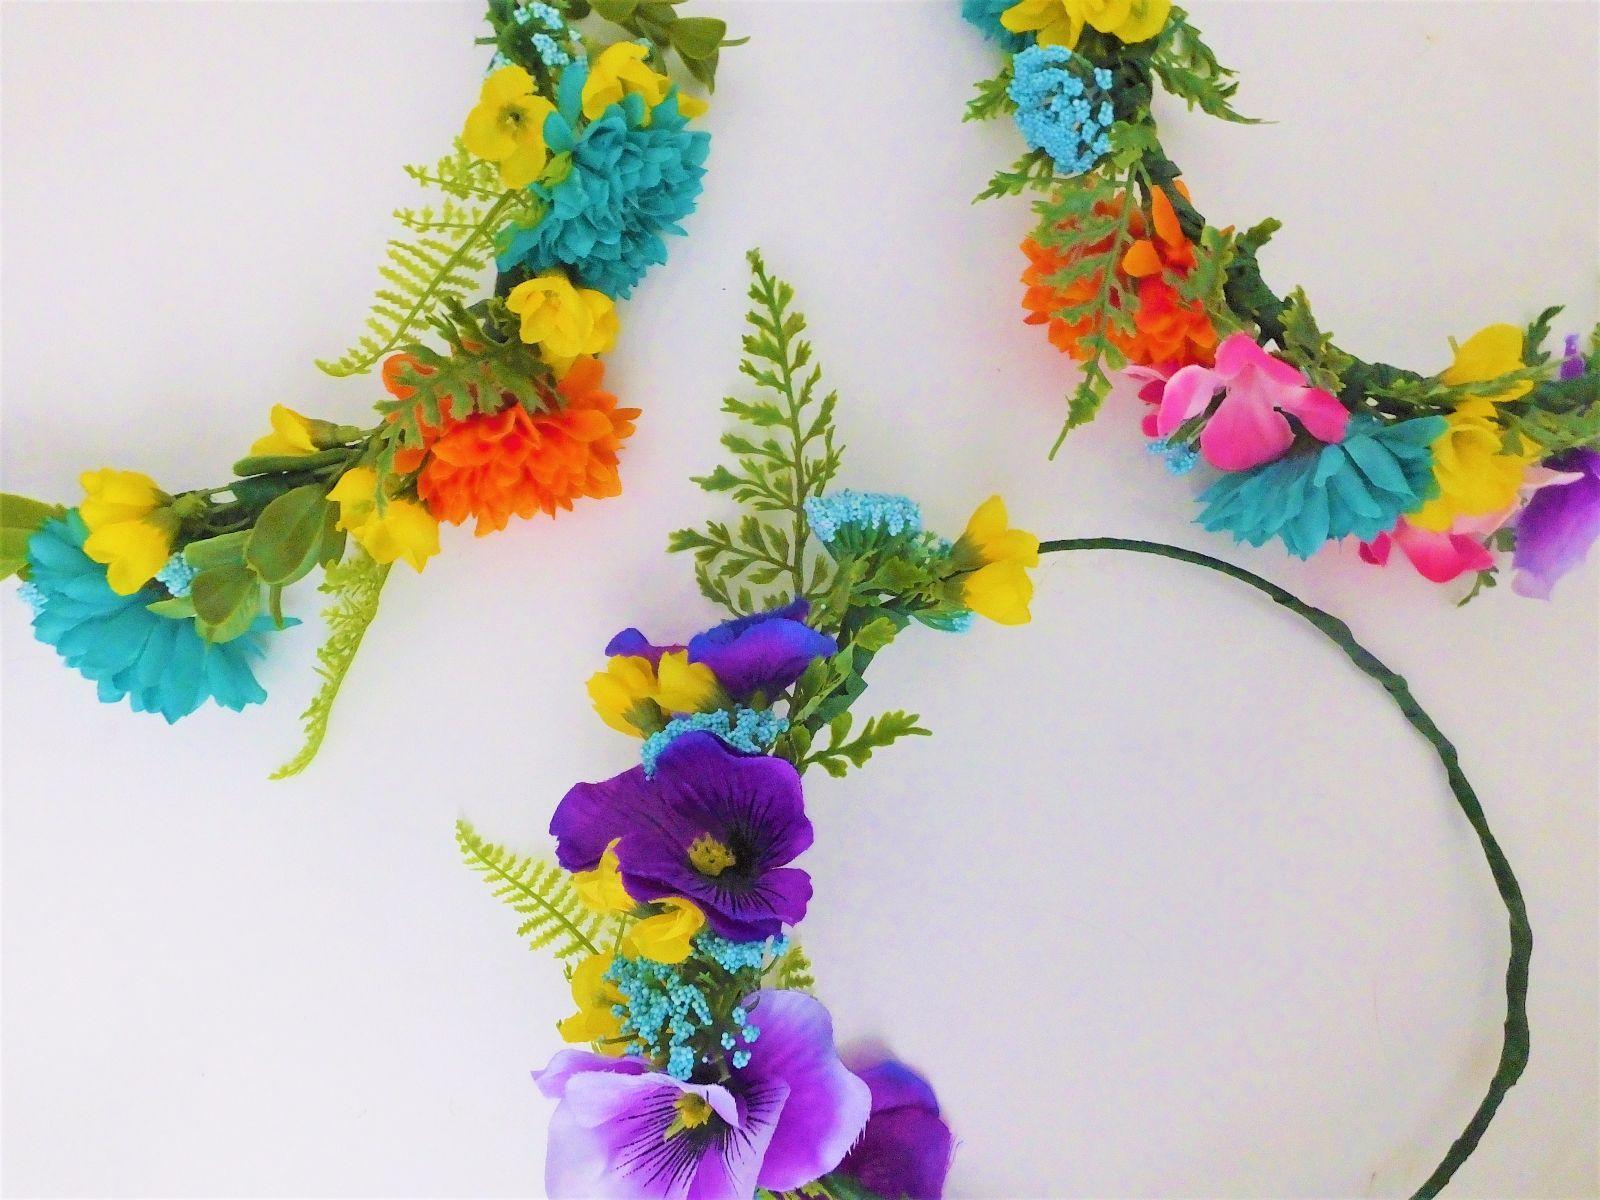 Diy flower crowns diy flower flower crowns and crown diy flower crowns izmirmasajfo Images